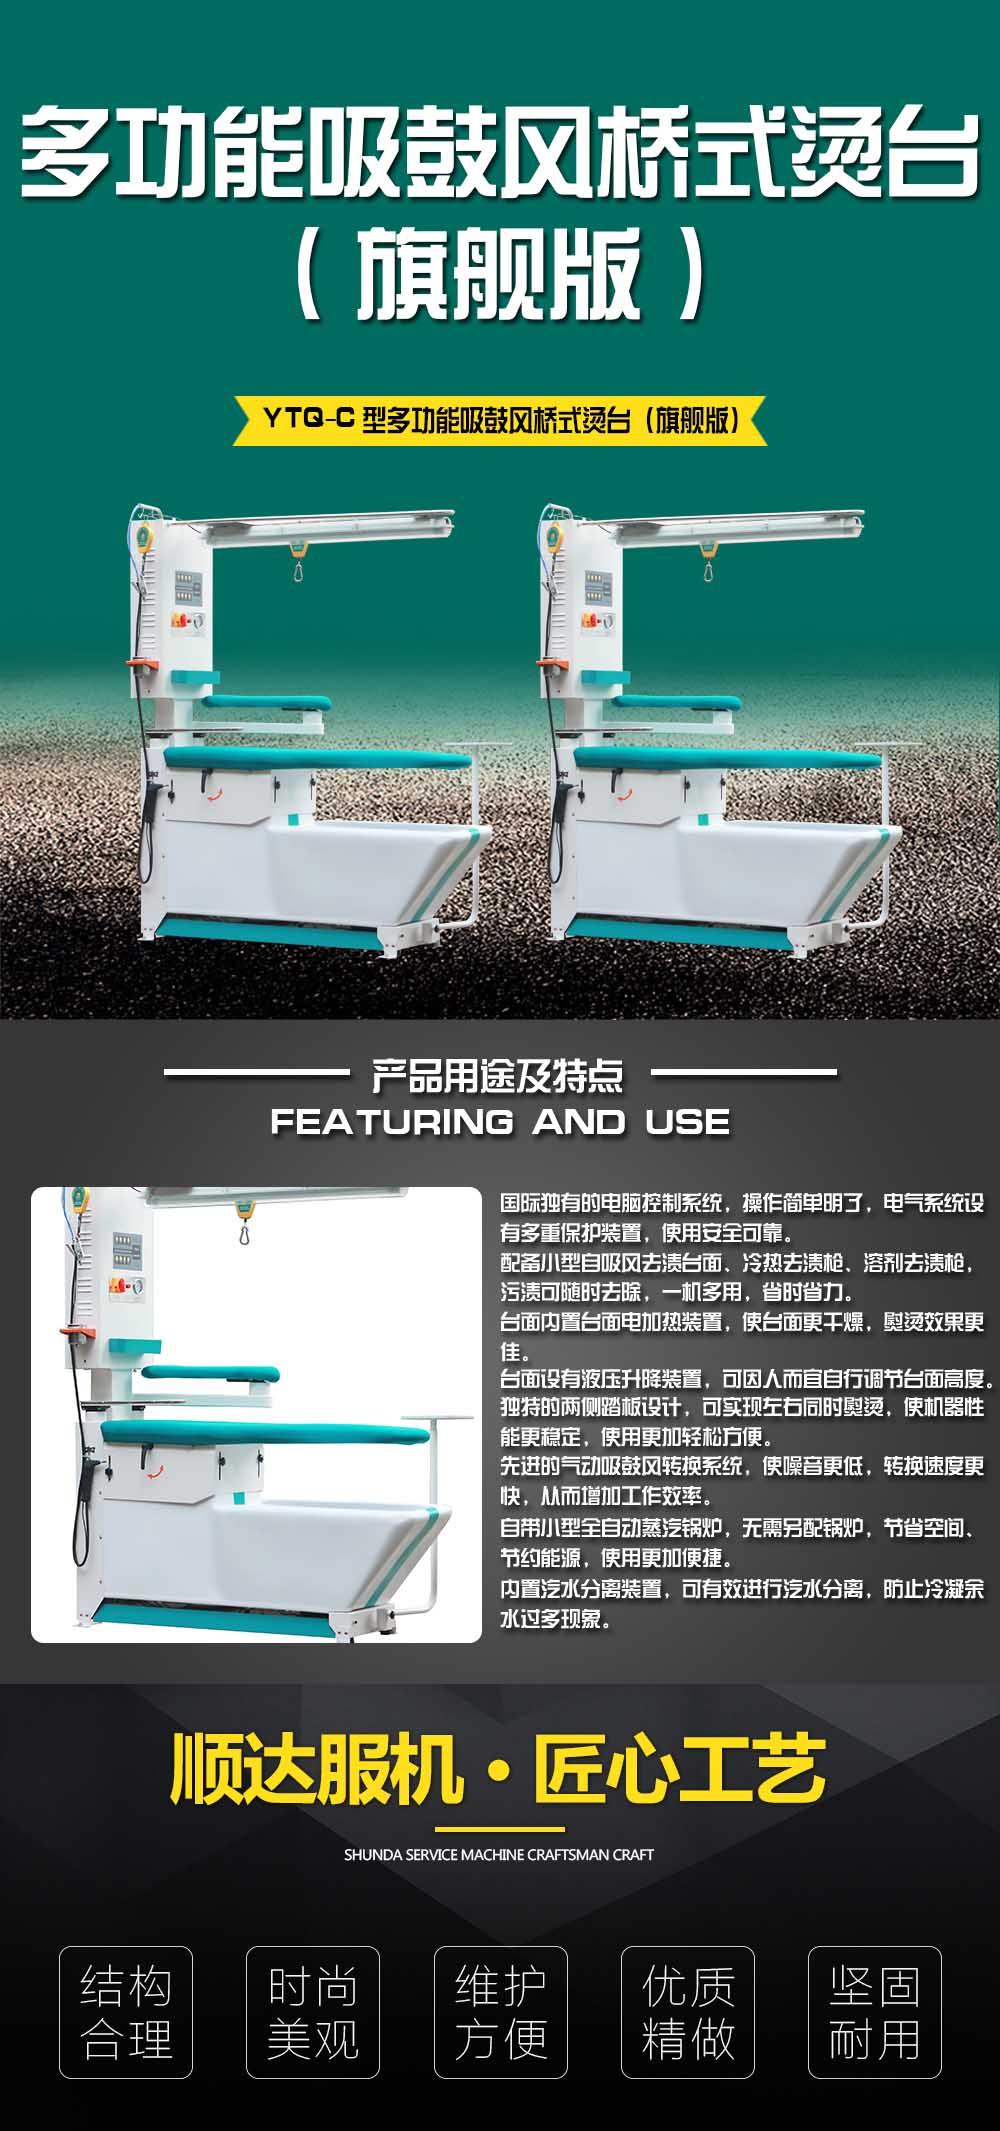 YTQ-C型多功能吸鼓风桥式宁夏烫台(旗舰版)